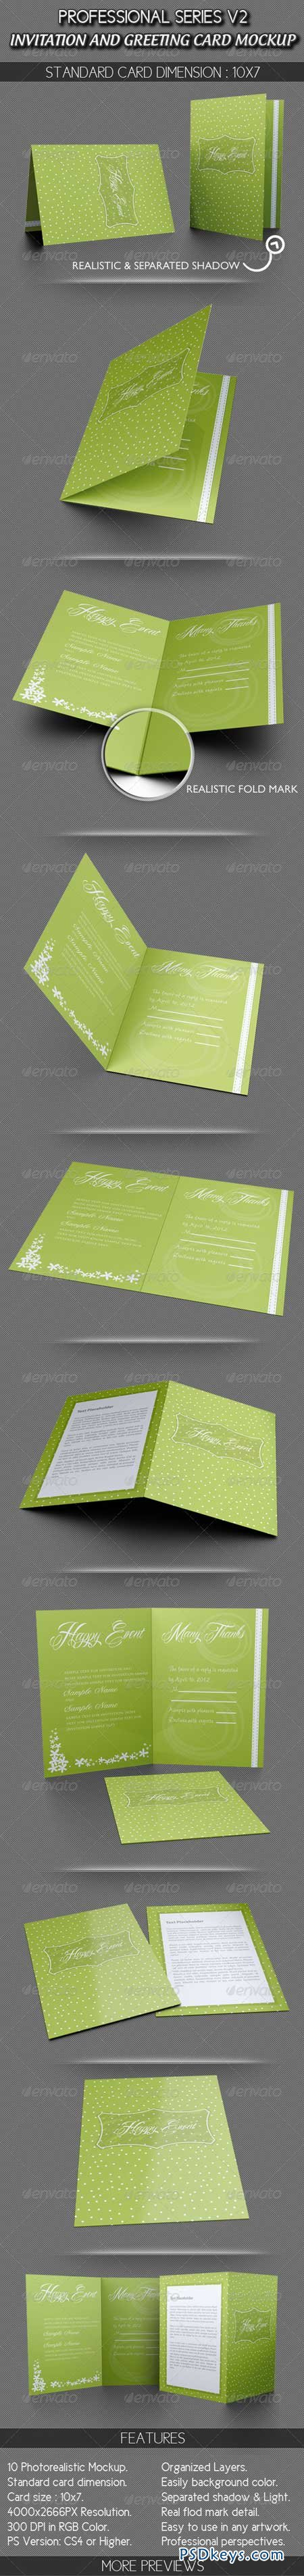 Invitation and greeting card mockup v1 2821029 free download invitation and greeting card mockup v1 2821029 kristyandbryce Gallery